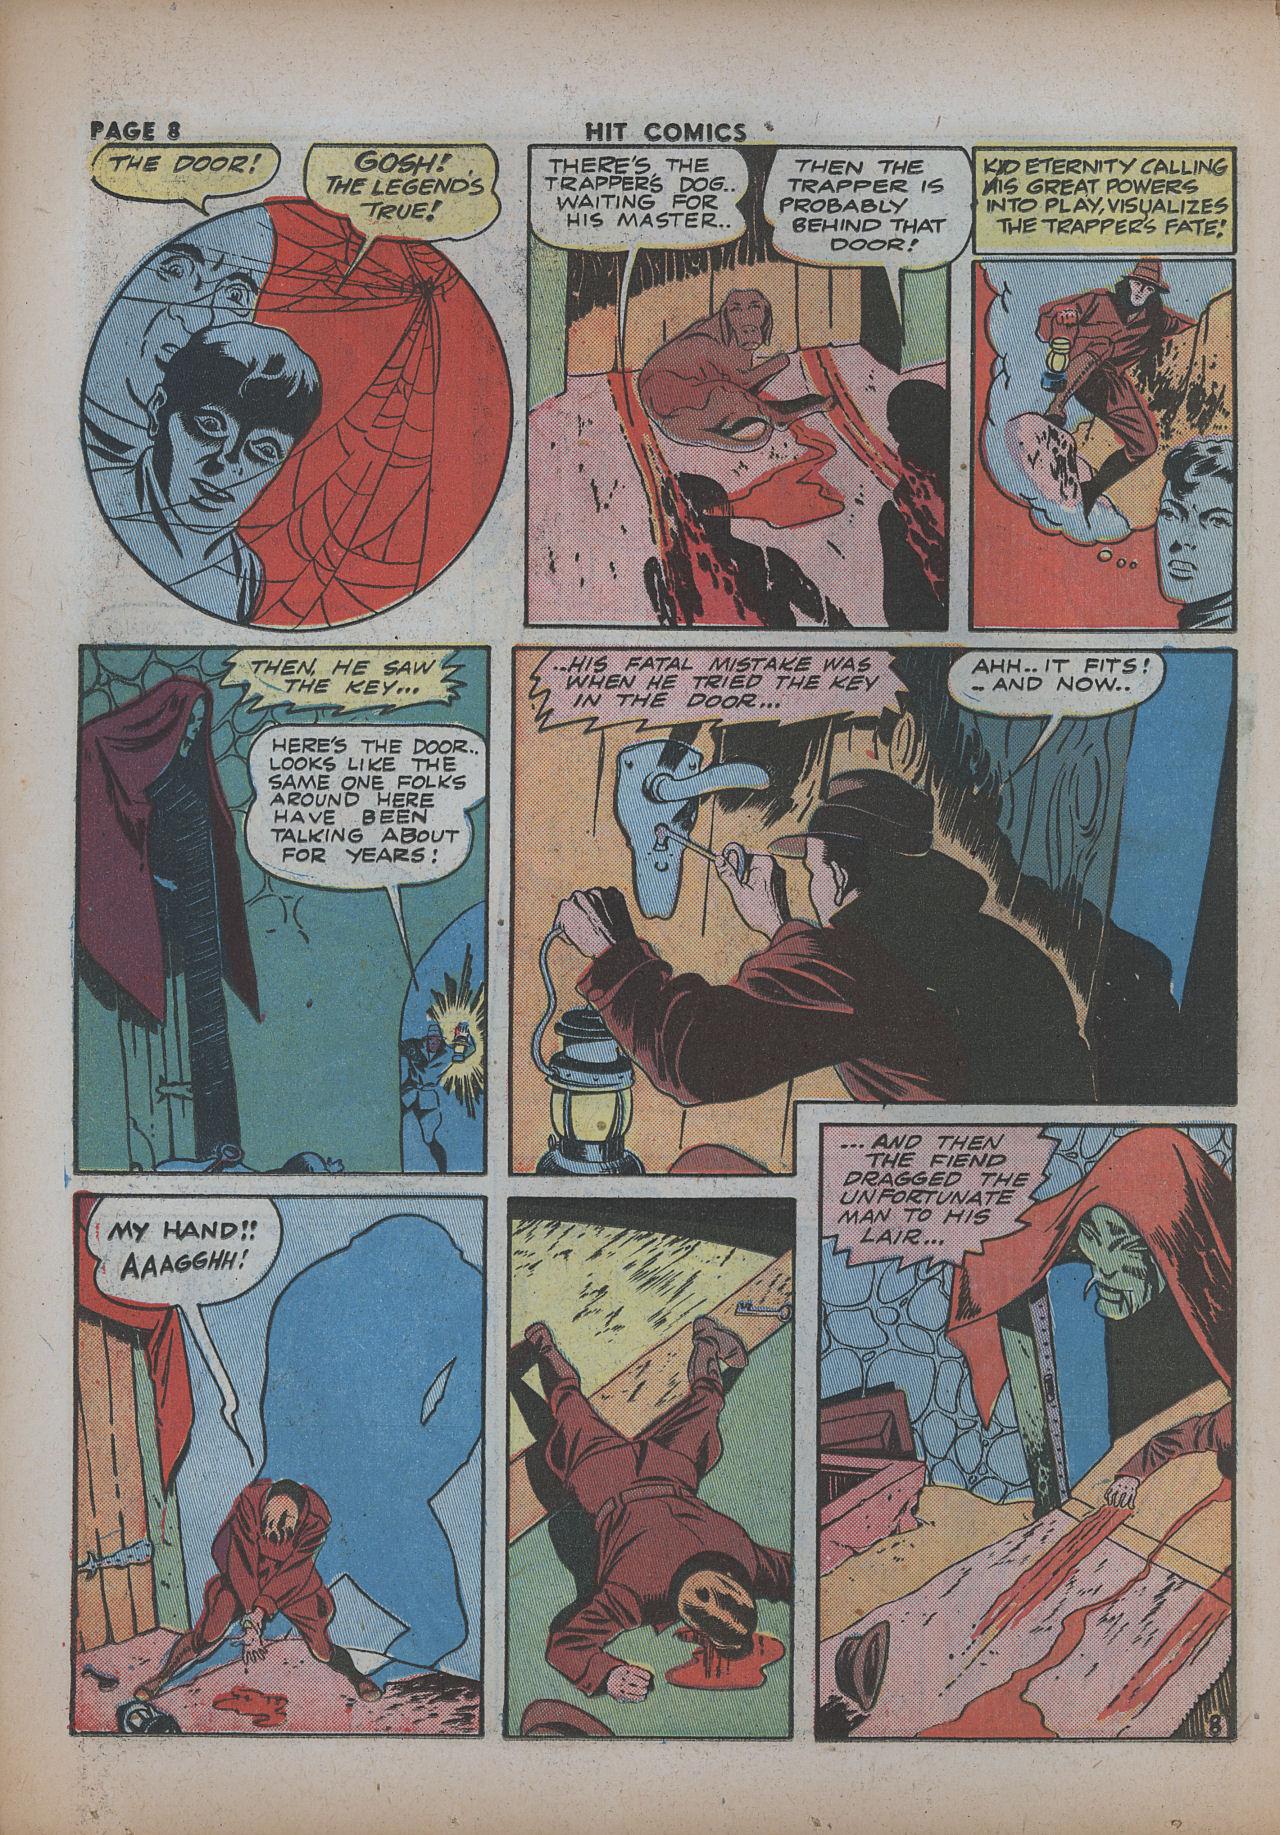 Read online Hit Comics comic -  Issue #26 - 10